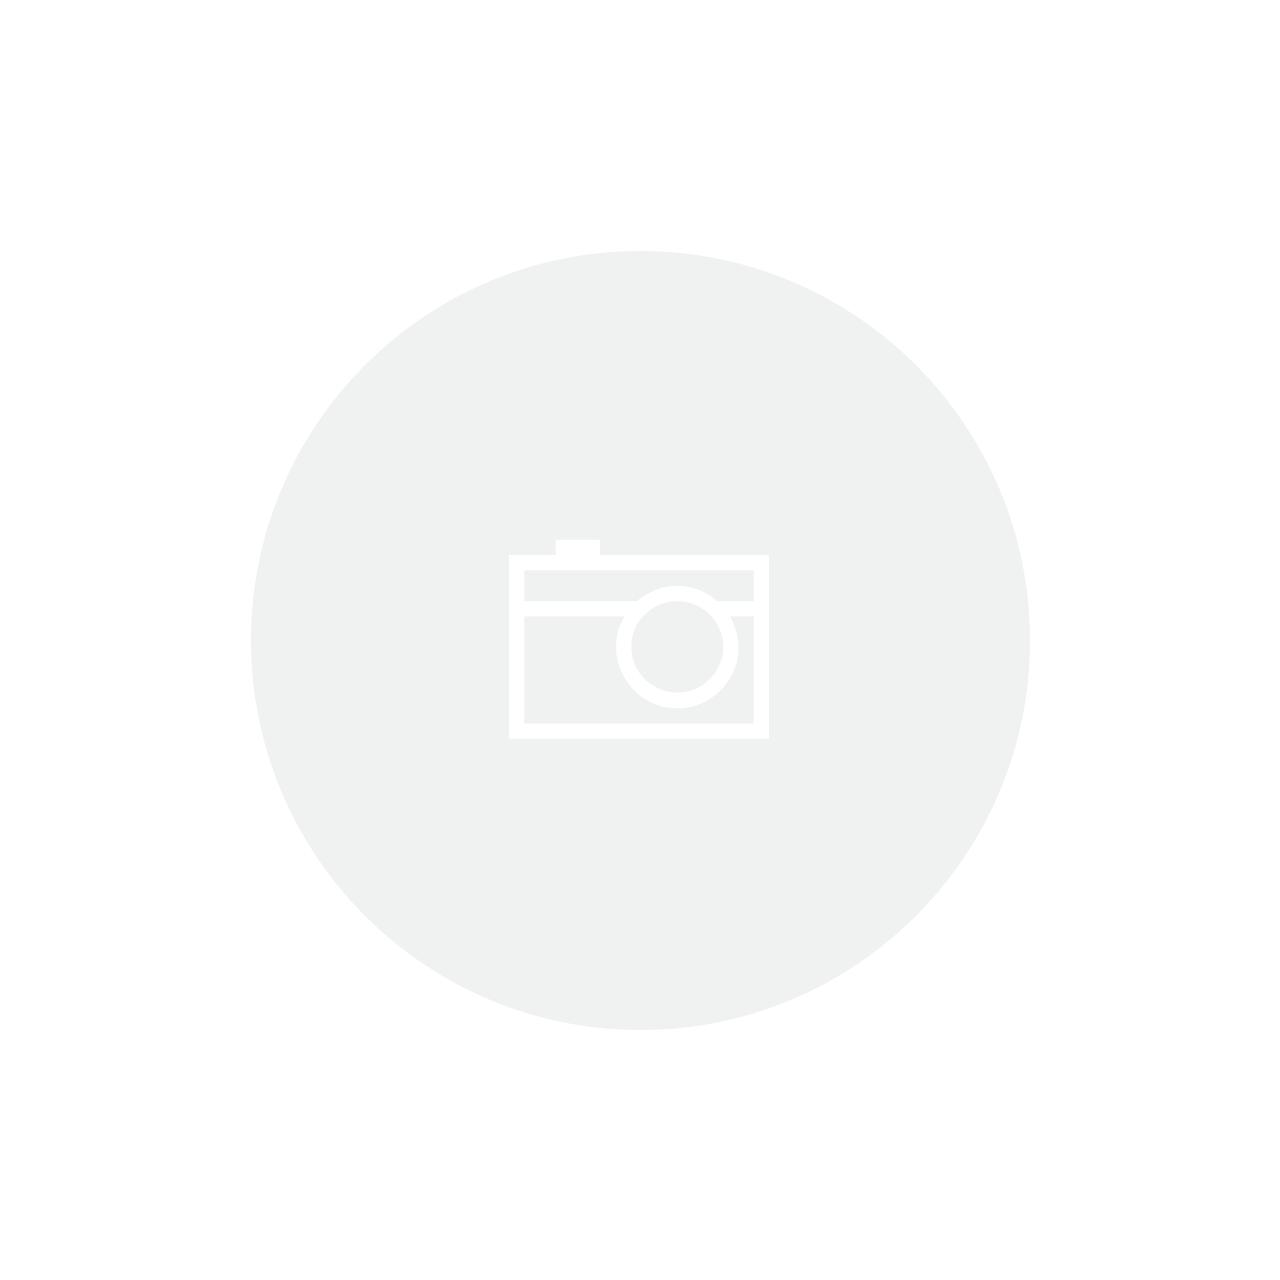 papel-textura-ref-1137